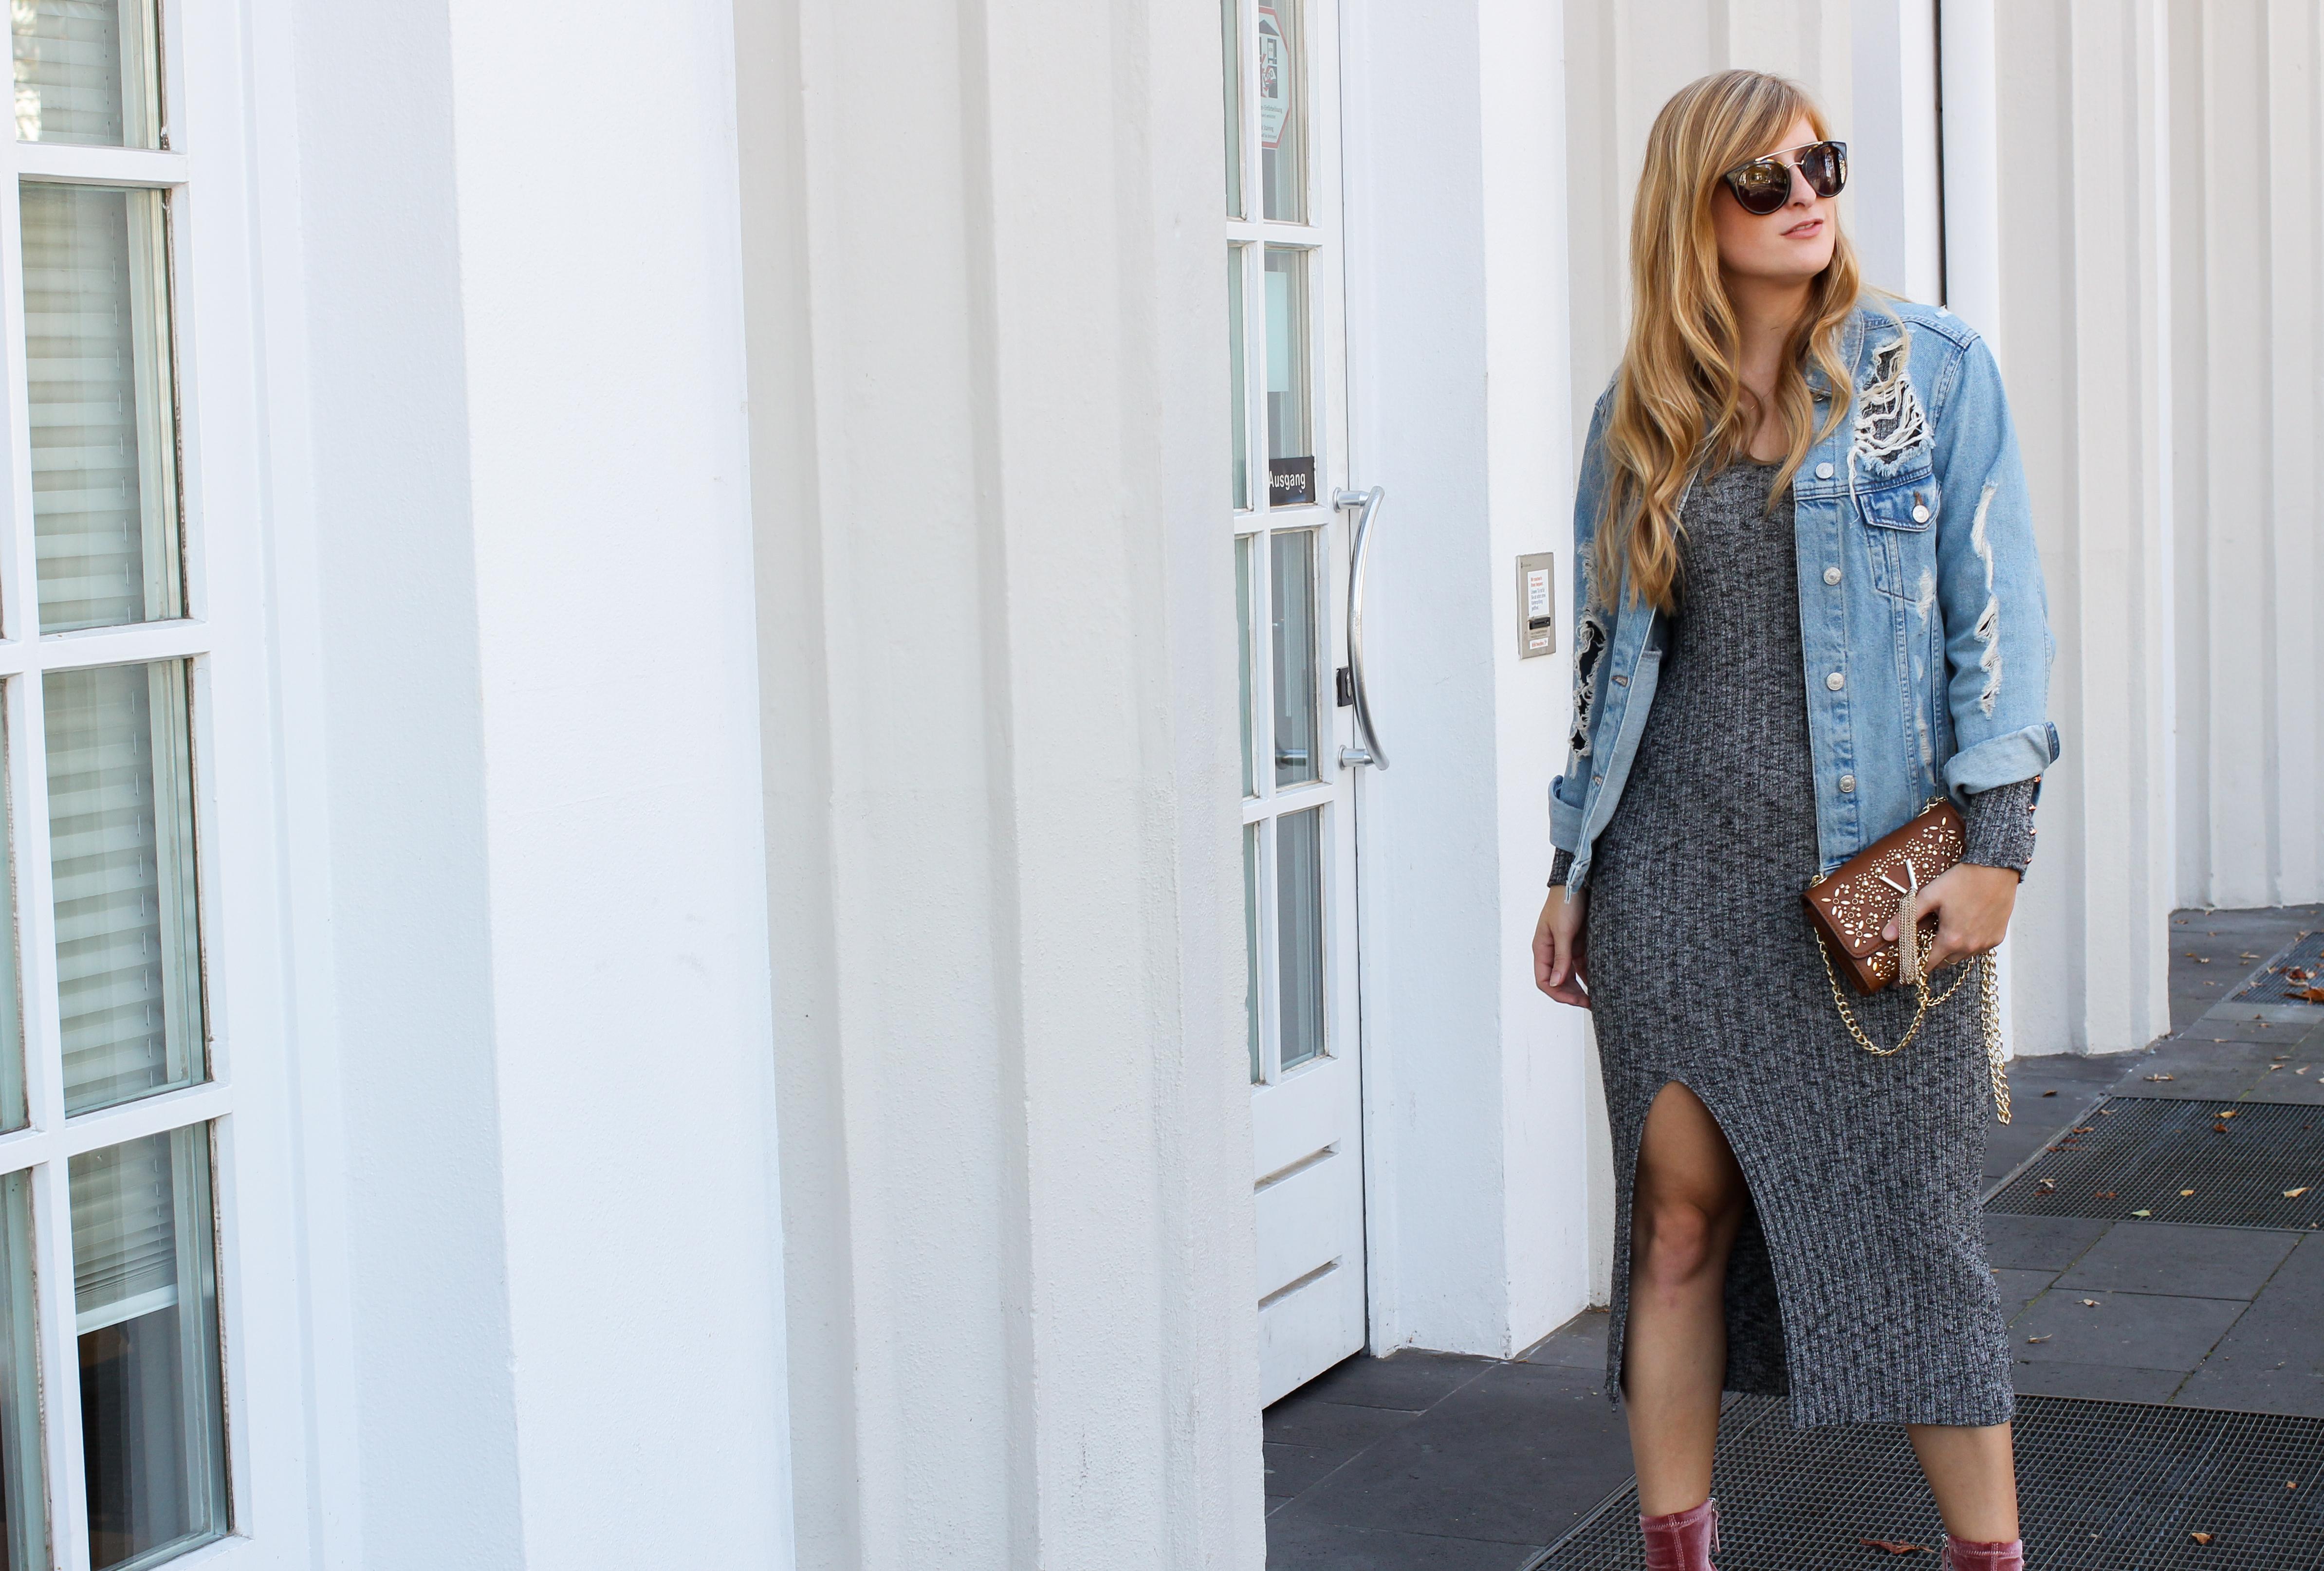 Herbstfavorit Wollkleid grau kombinieren Outfit Jeansjacke Valentino Handbags Fashion Blog Bonn Herbstoutfit 5